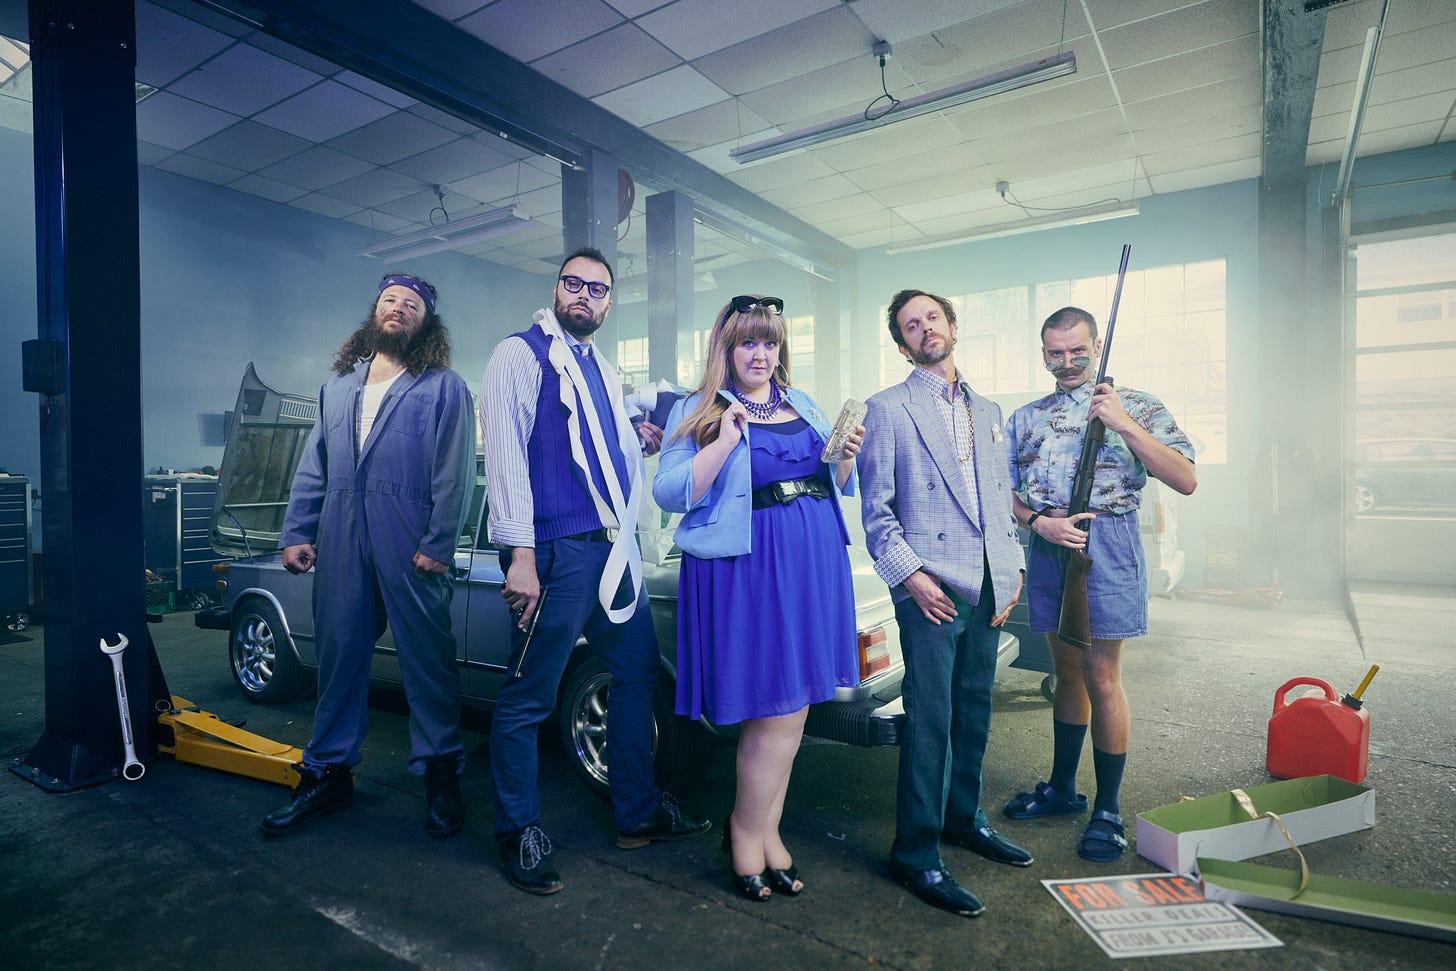 group shot of comedians in a mechanics garage